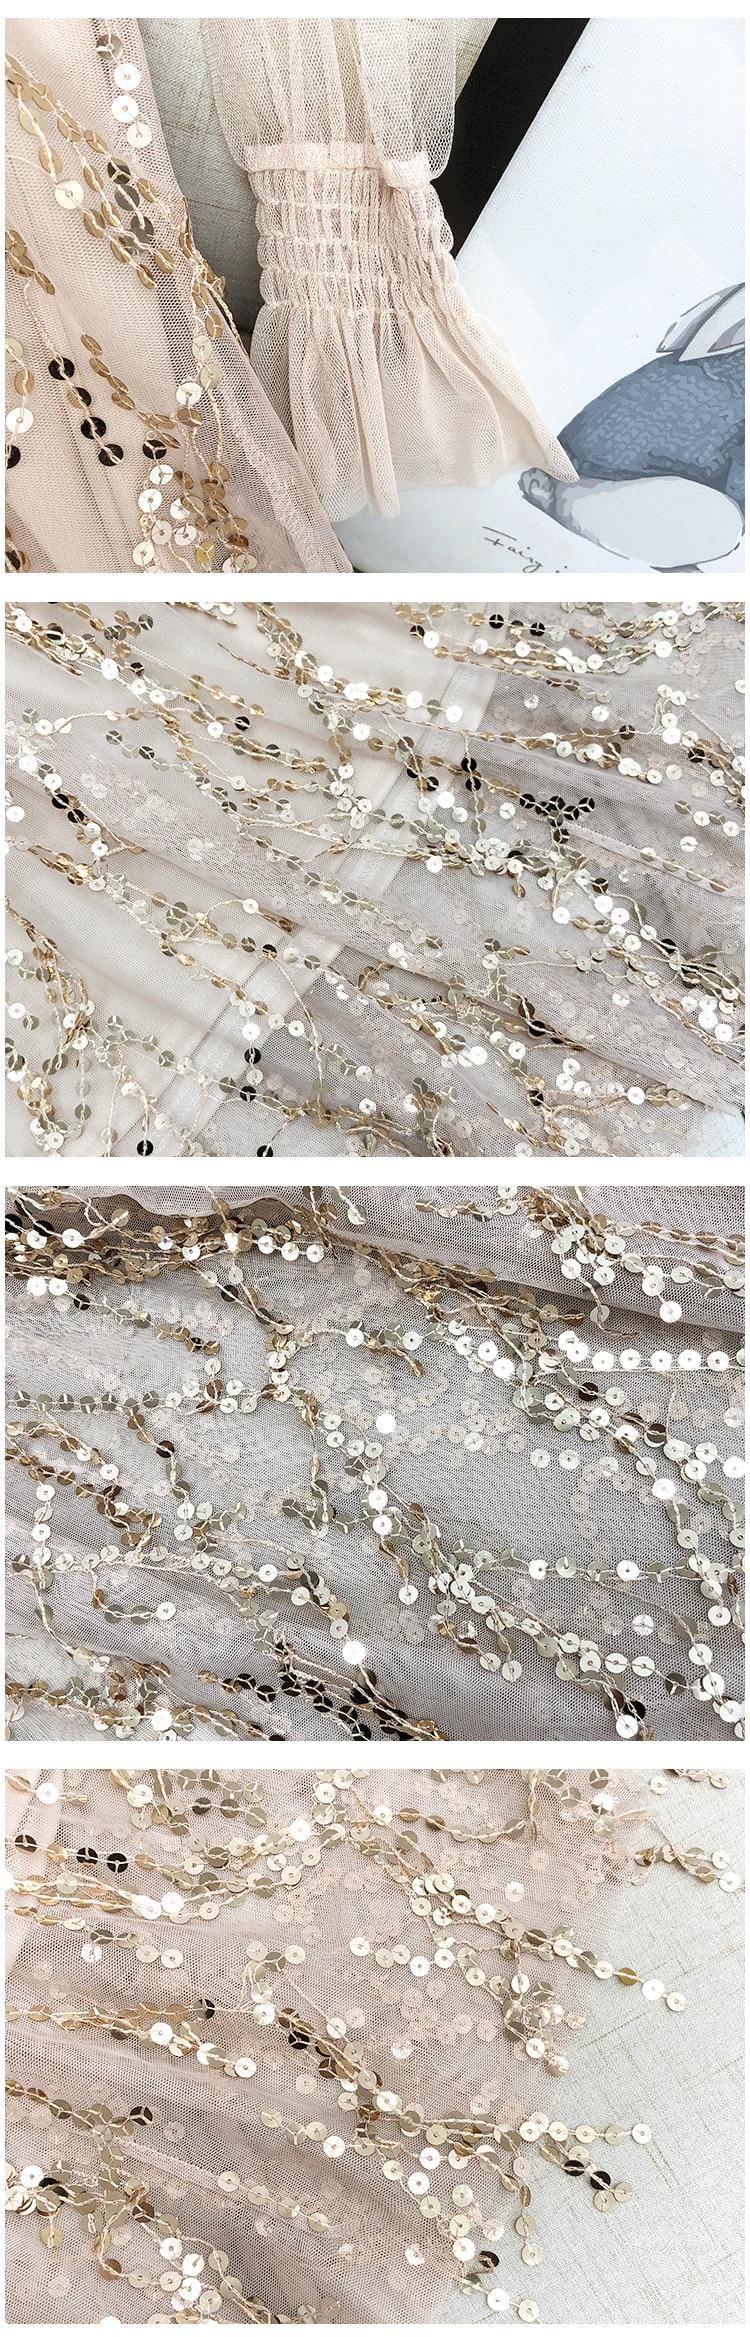 Sequins Elegant Party Dress 5